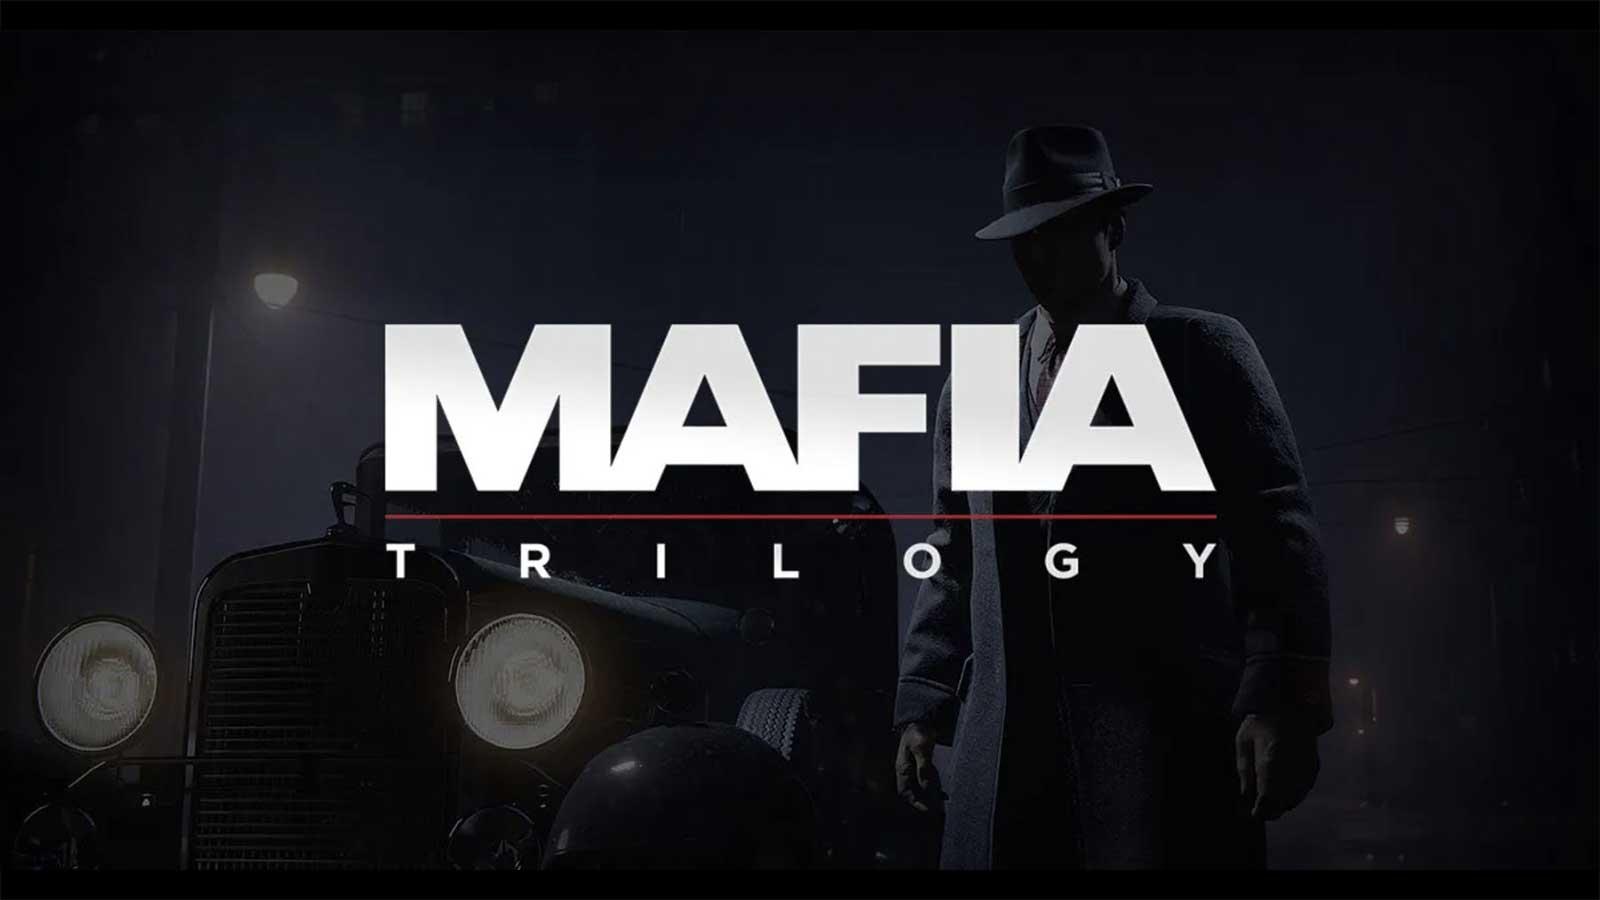 mafia trilogy header babt